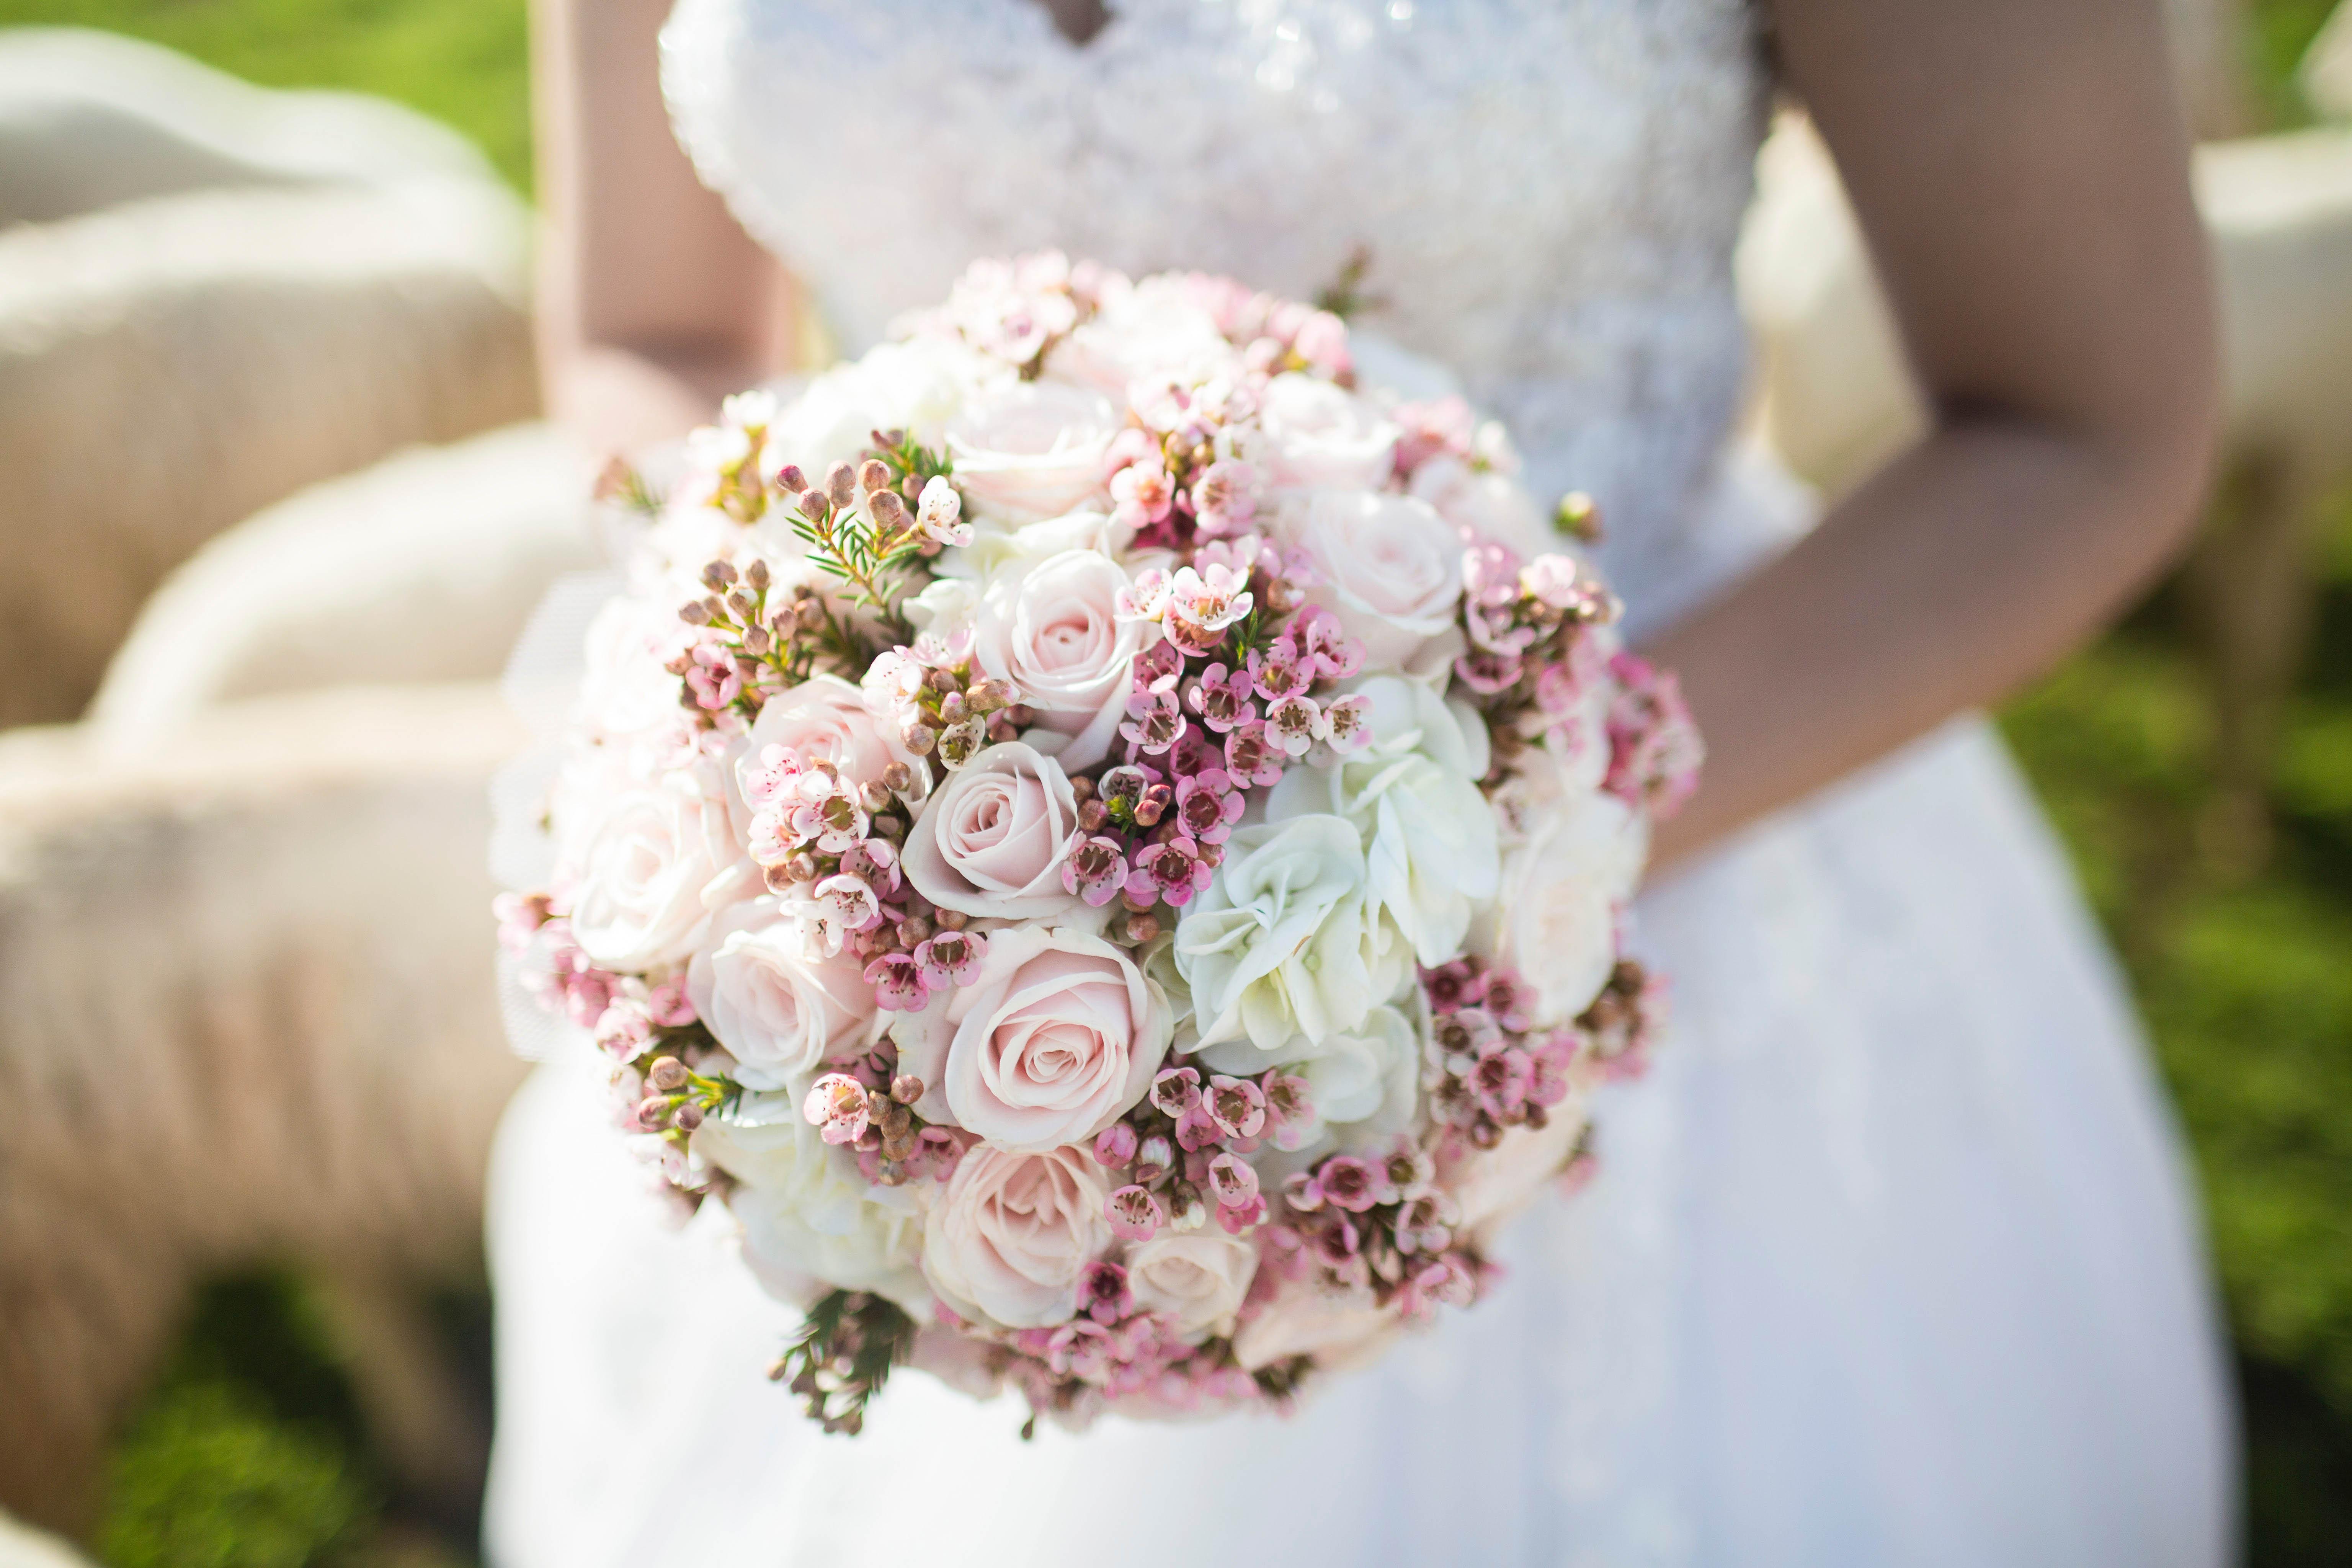 candid wedding photography guide - photojaanic -20